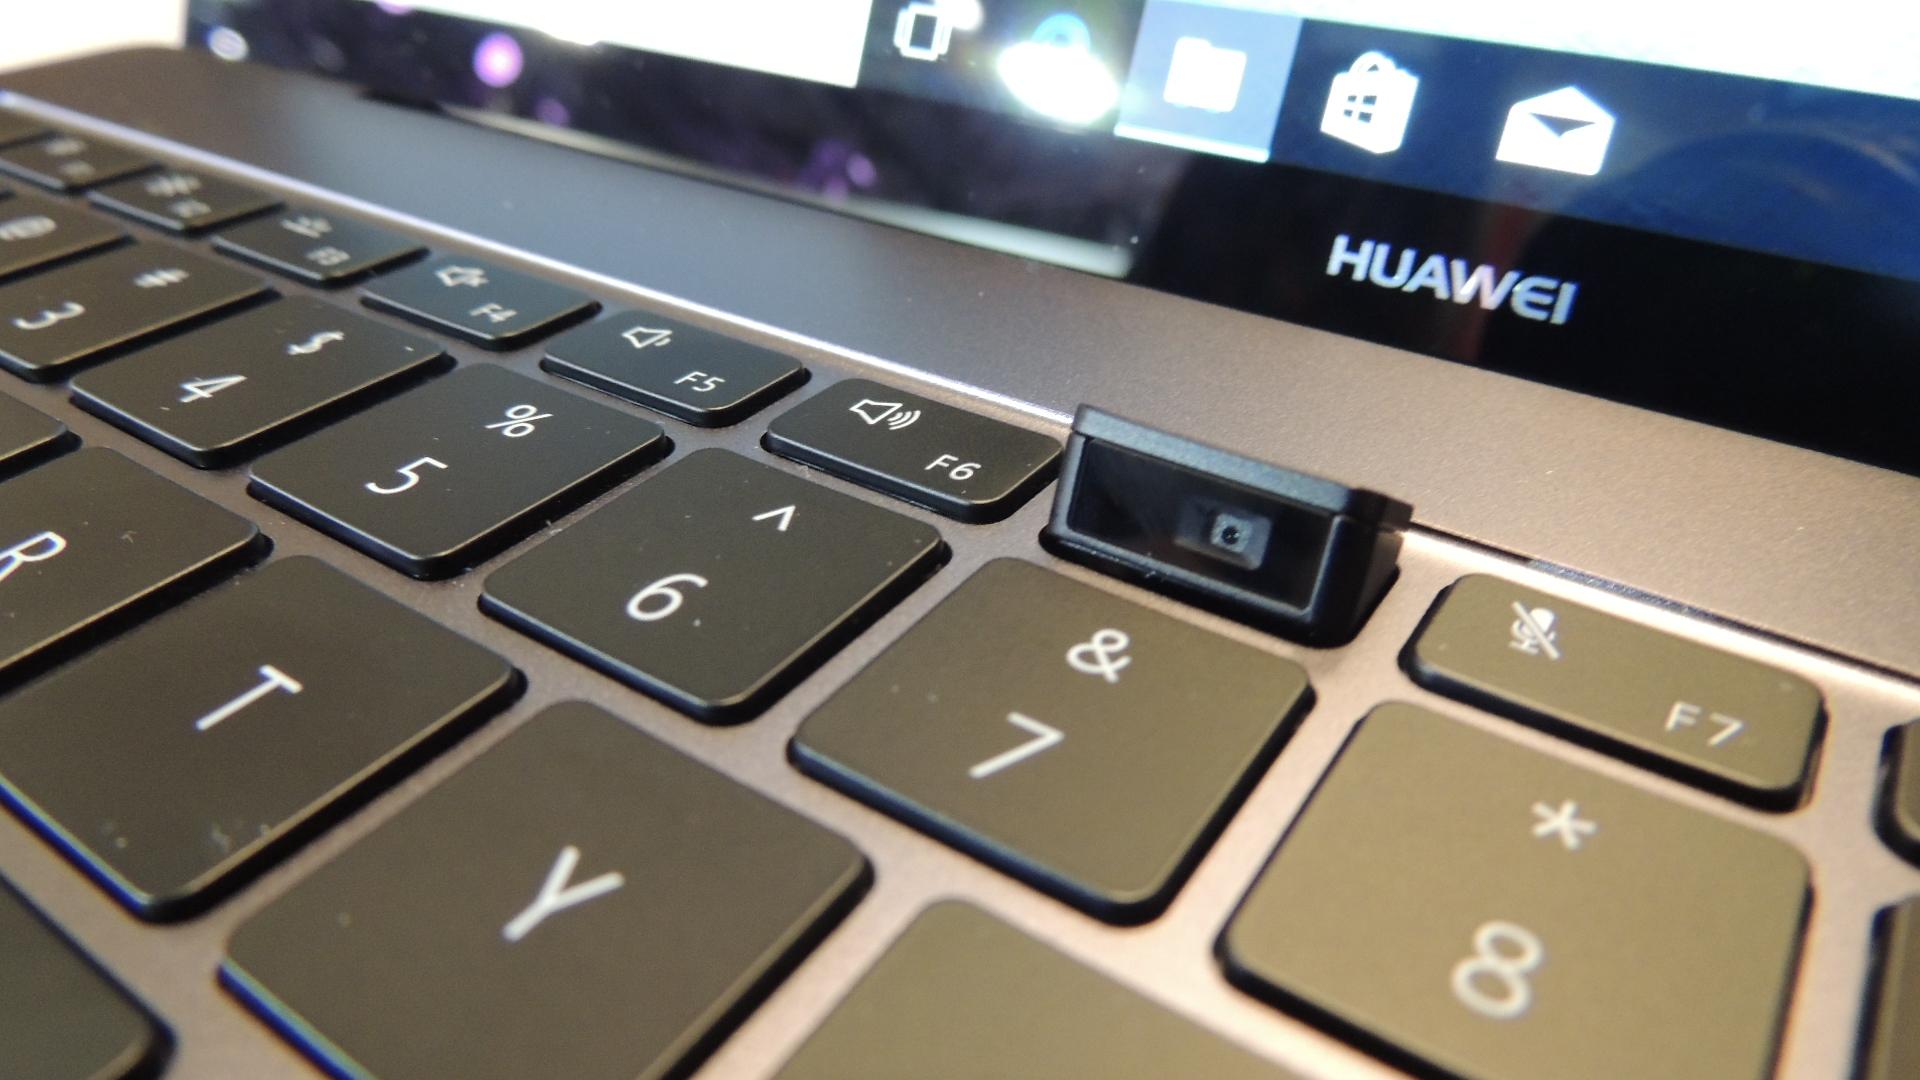 nueva camara en Huawei Matebook x pro